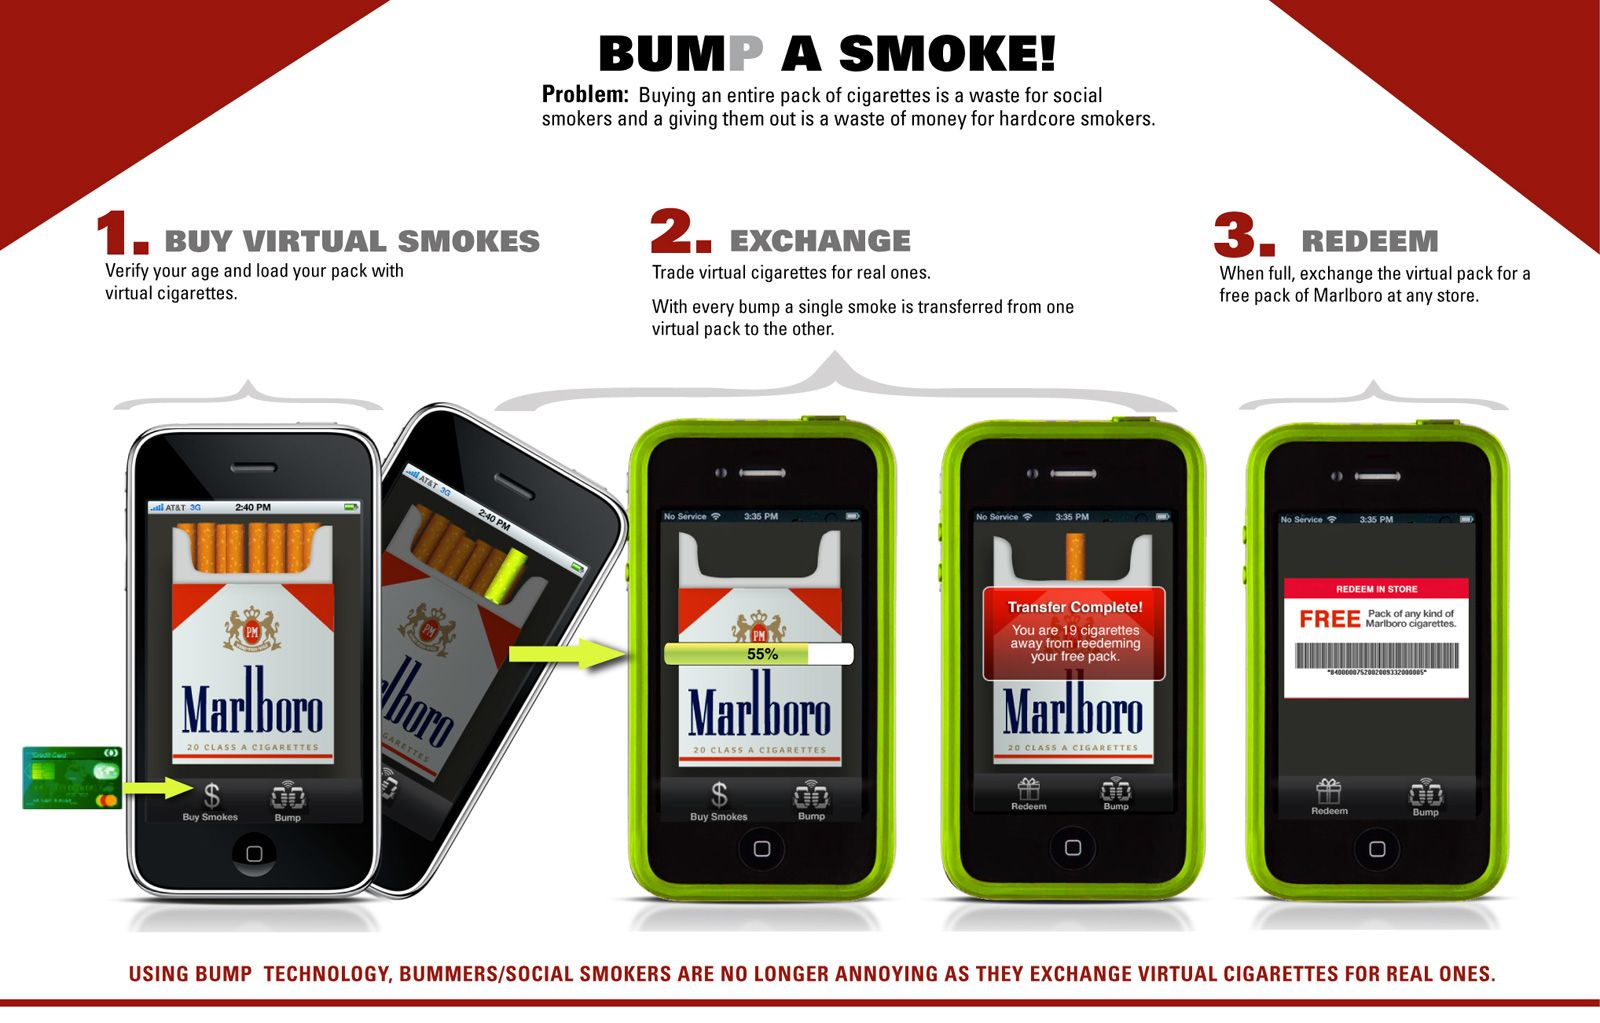 Pin by Melissa Perrotte on tobacco Smoke, Bump, Creative